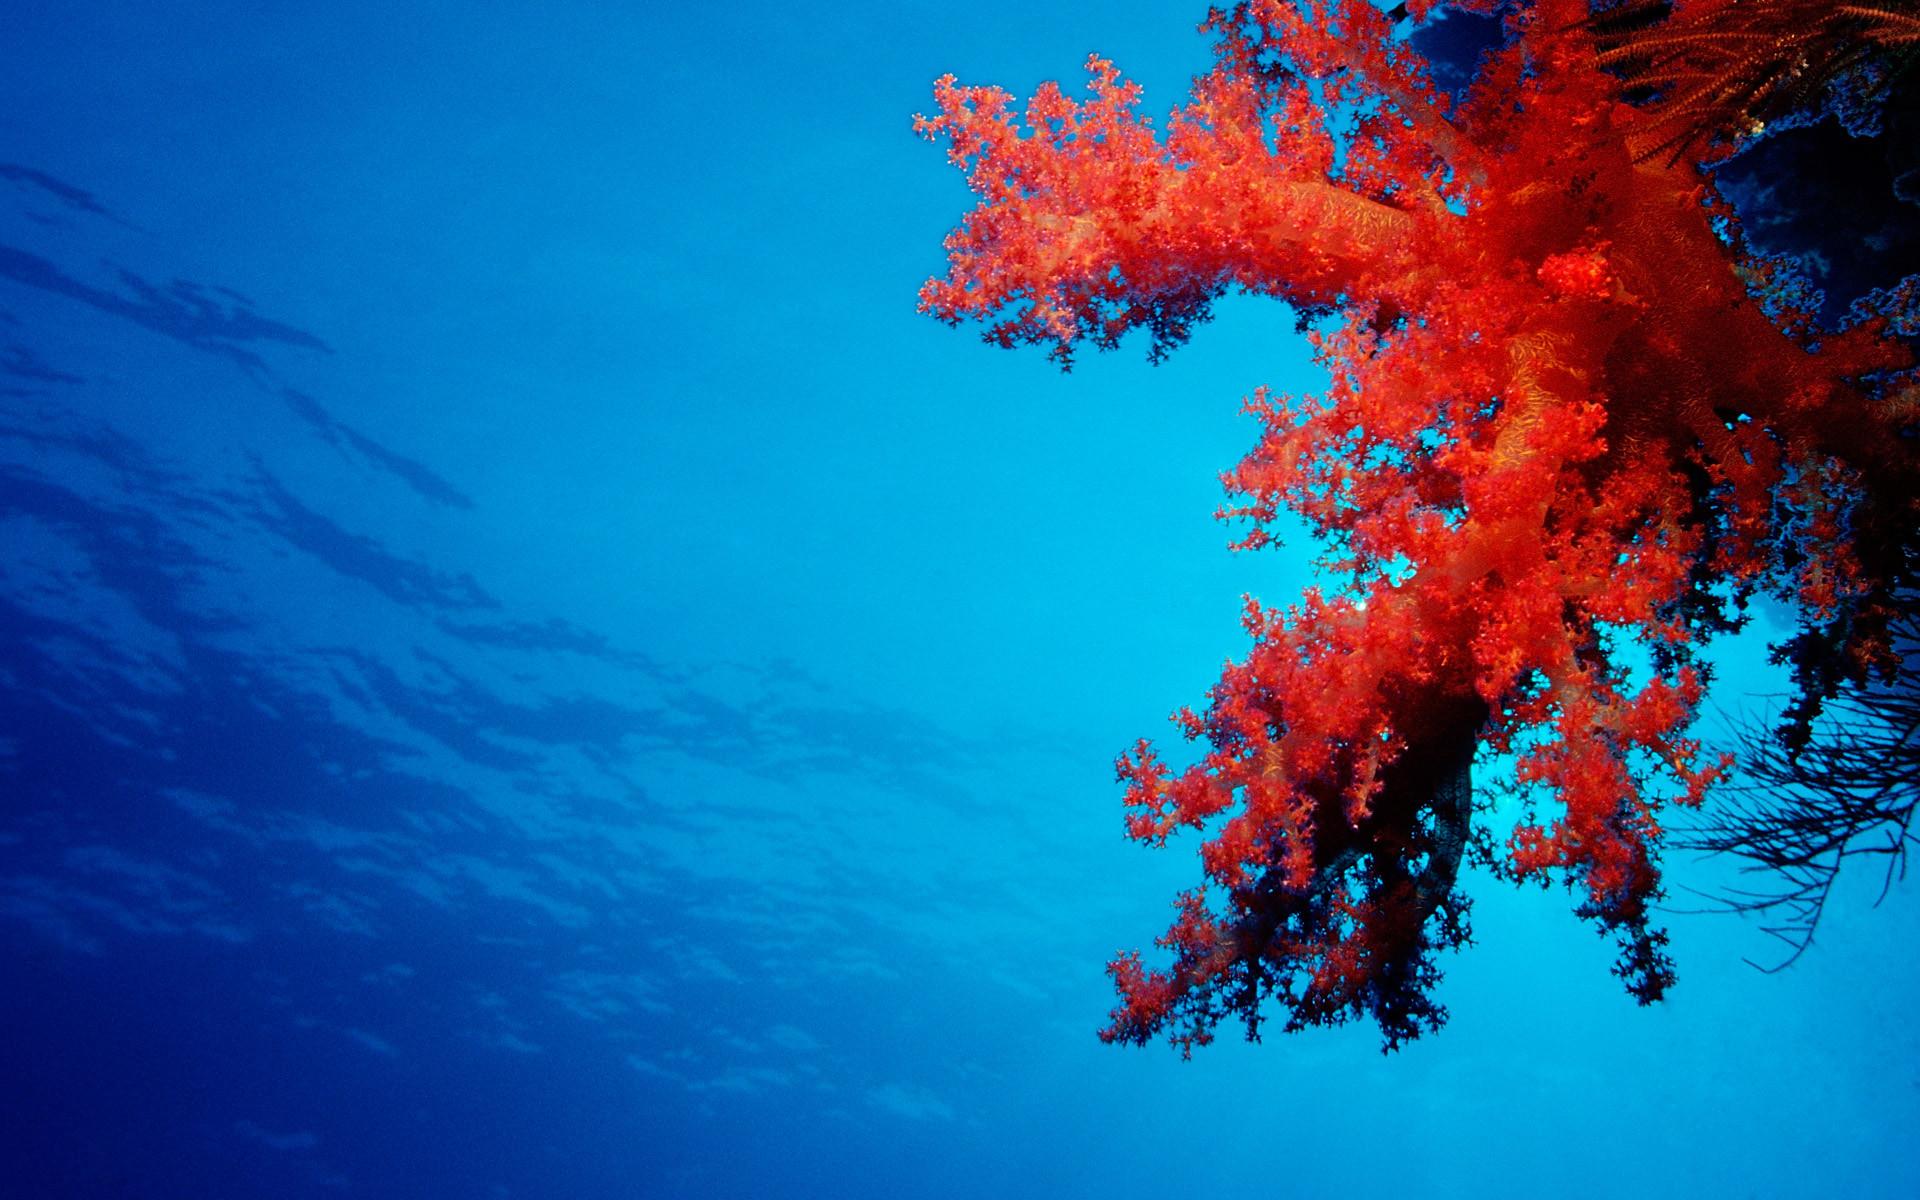 Coral reef 4K Ultra HD Wallpaper | 8k ultra hd 4k ultra hd hd 1080 hd